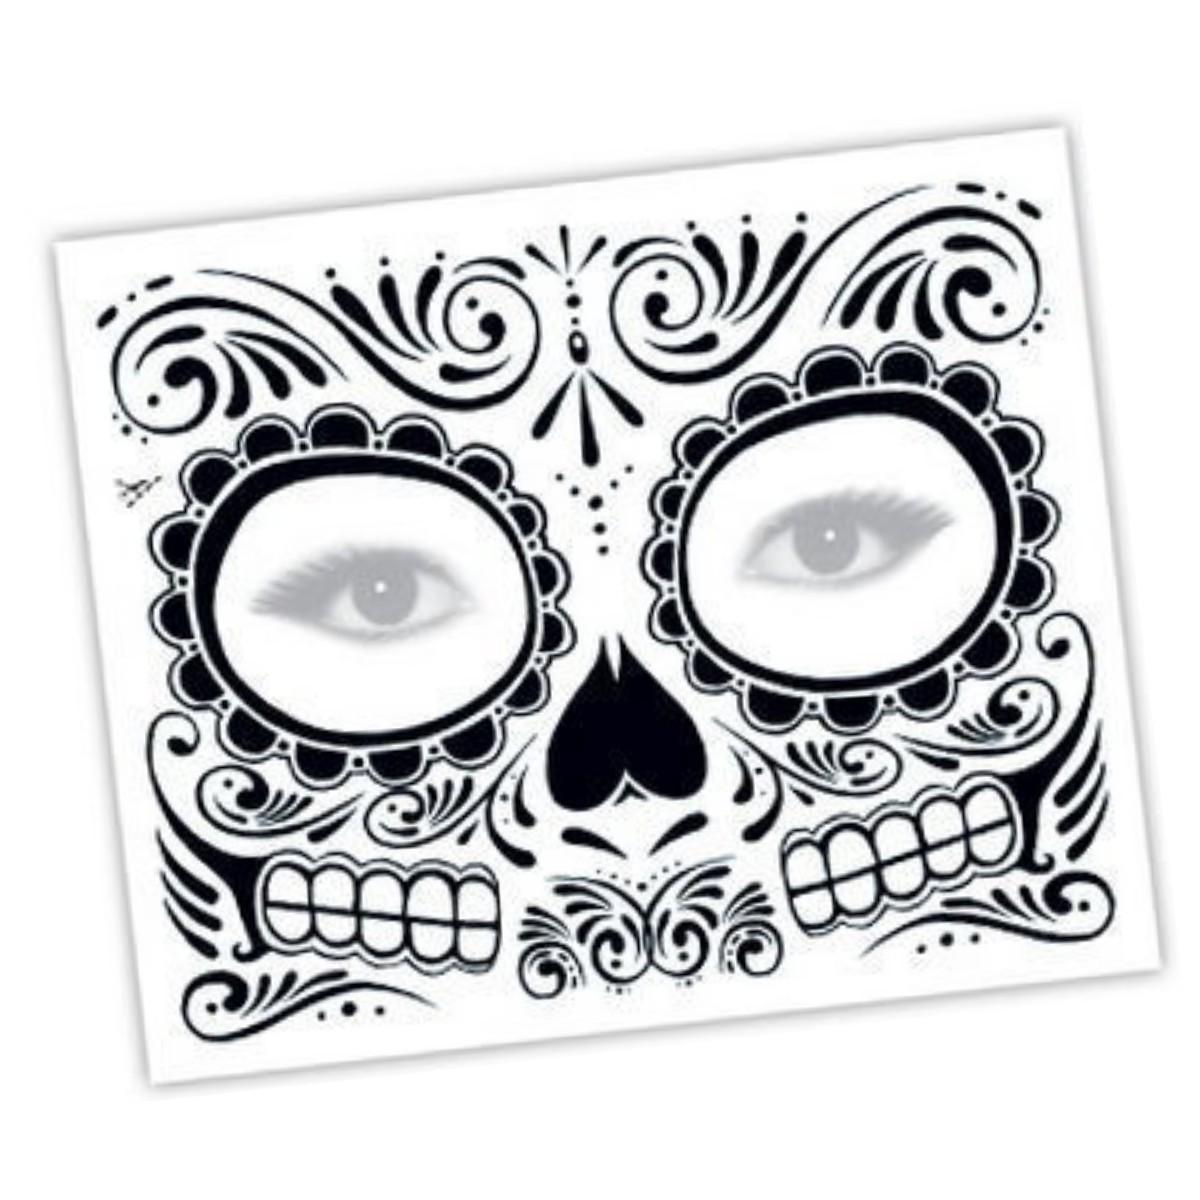 Tatuaje Temporal Mascara Dia De Los Muertos Maquillaje Ideal Eventos